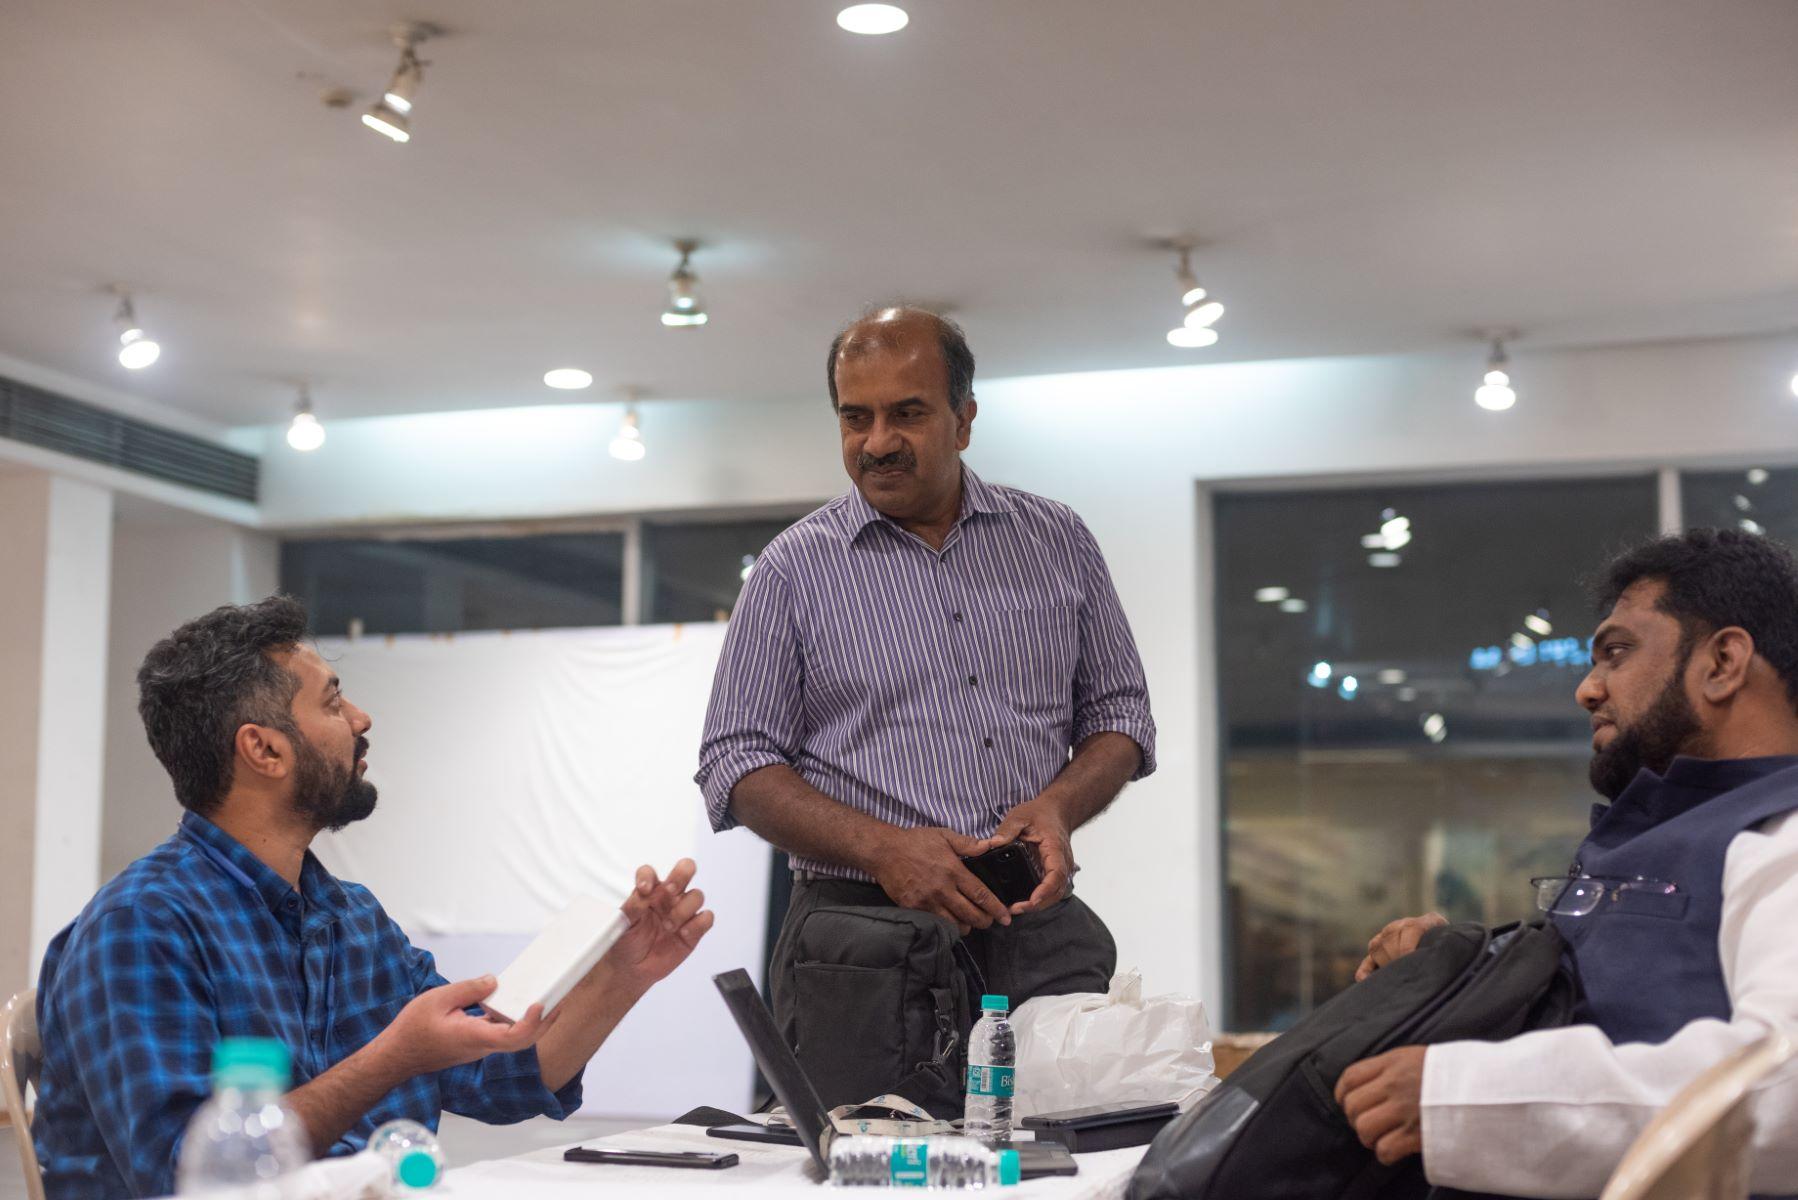 Azam Khan discusses flood relief work with SDIF co-founder Khalid Saifullah, and Feroz Baig